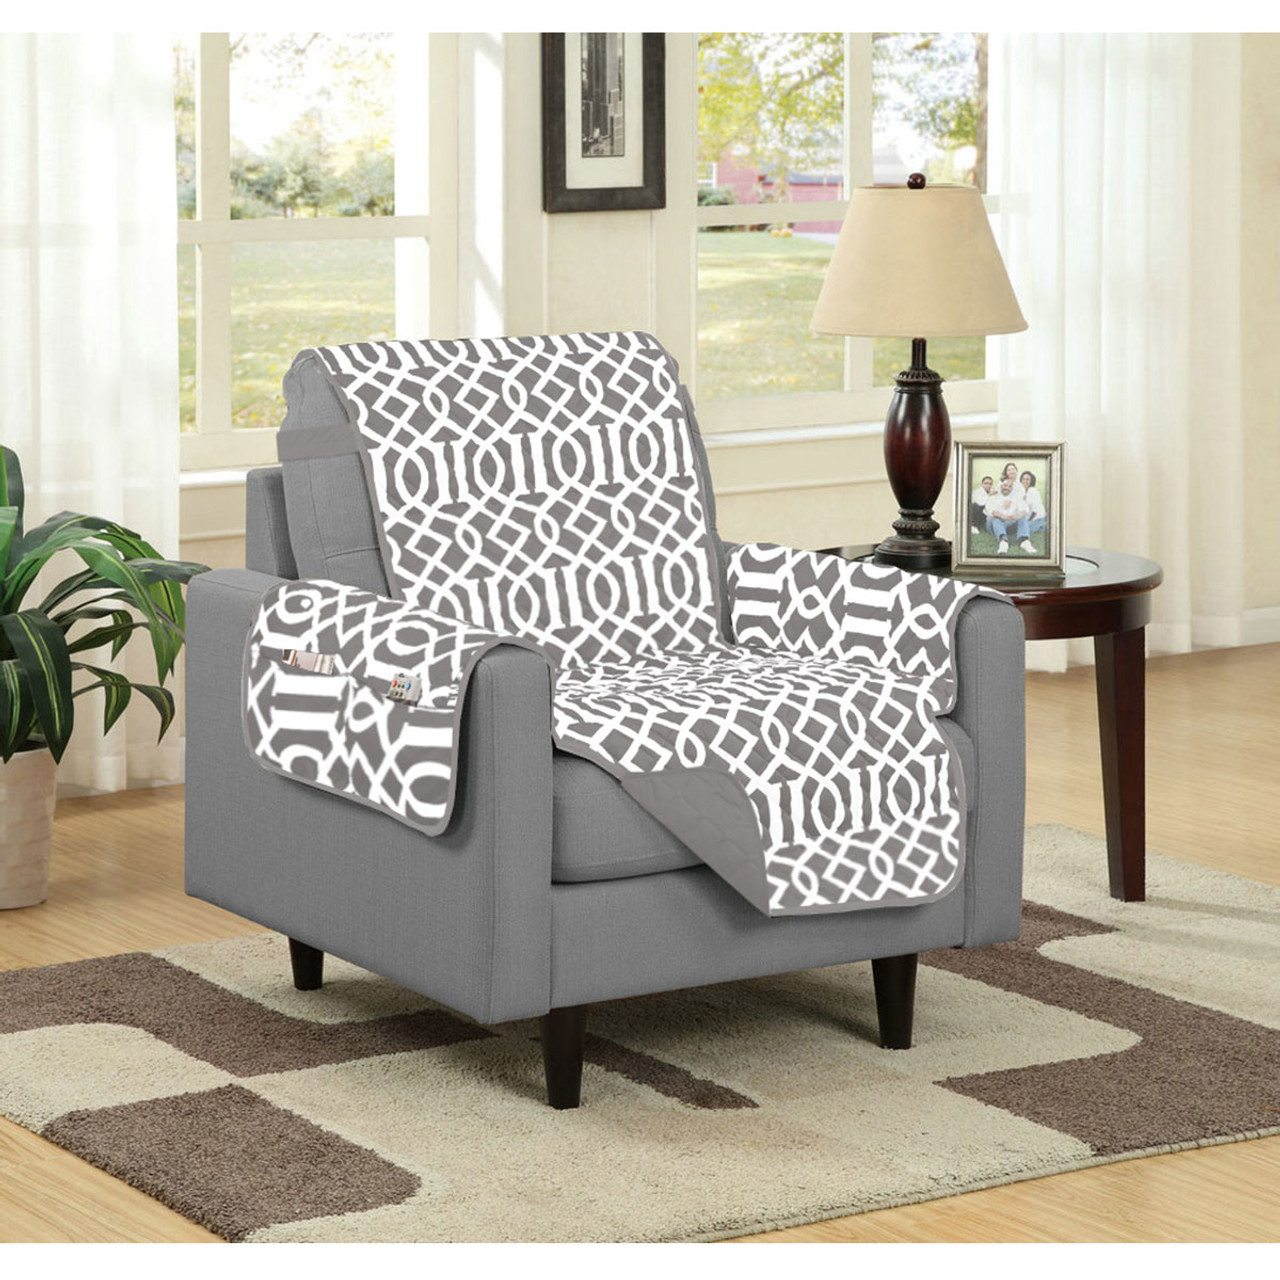 home essentials furniture. dallas reversible solidprint microfiber furniture protector with strap u0026 side pockets home essentials t